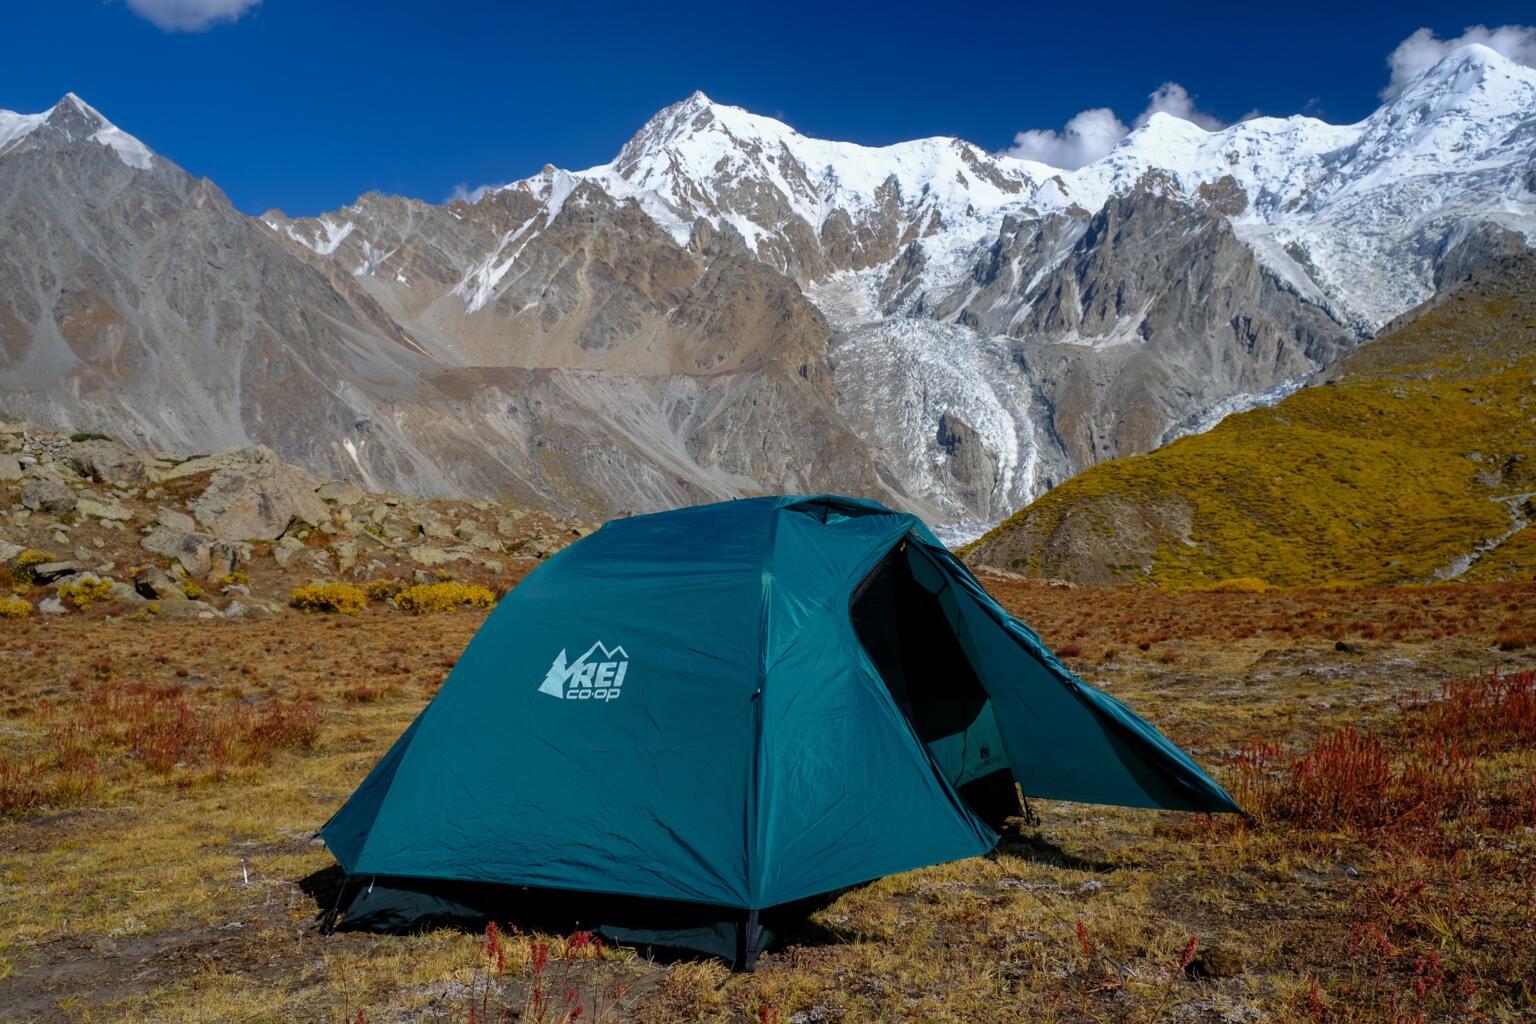 half dome 2 plus tent review